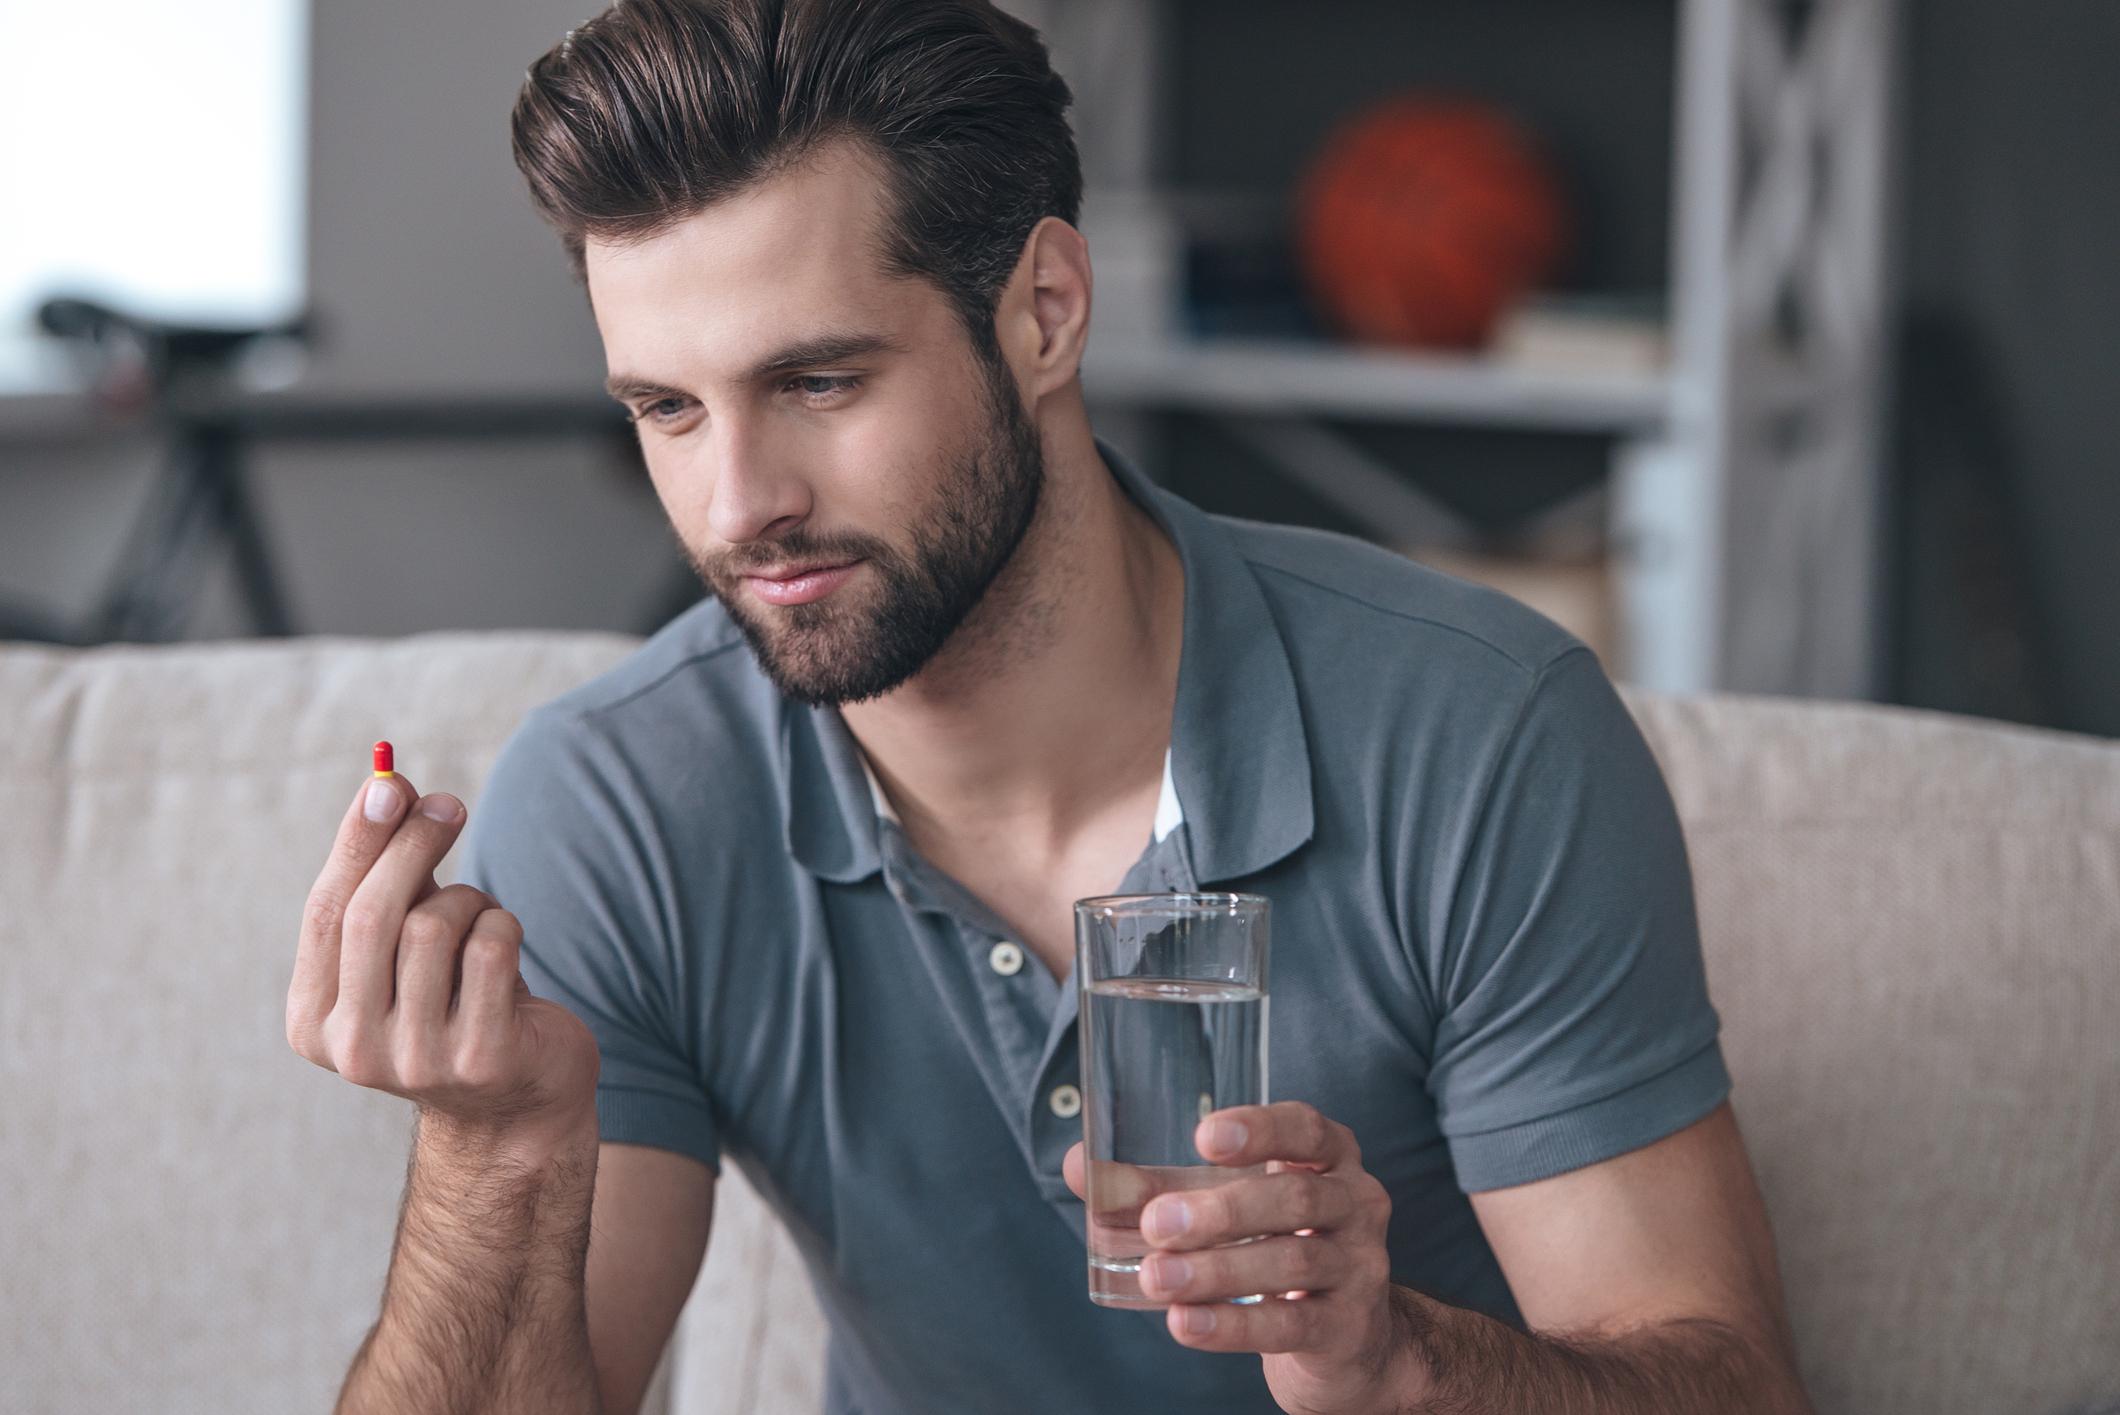 Do Beard Growth Vitamins Work? | LoveToKnow